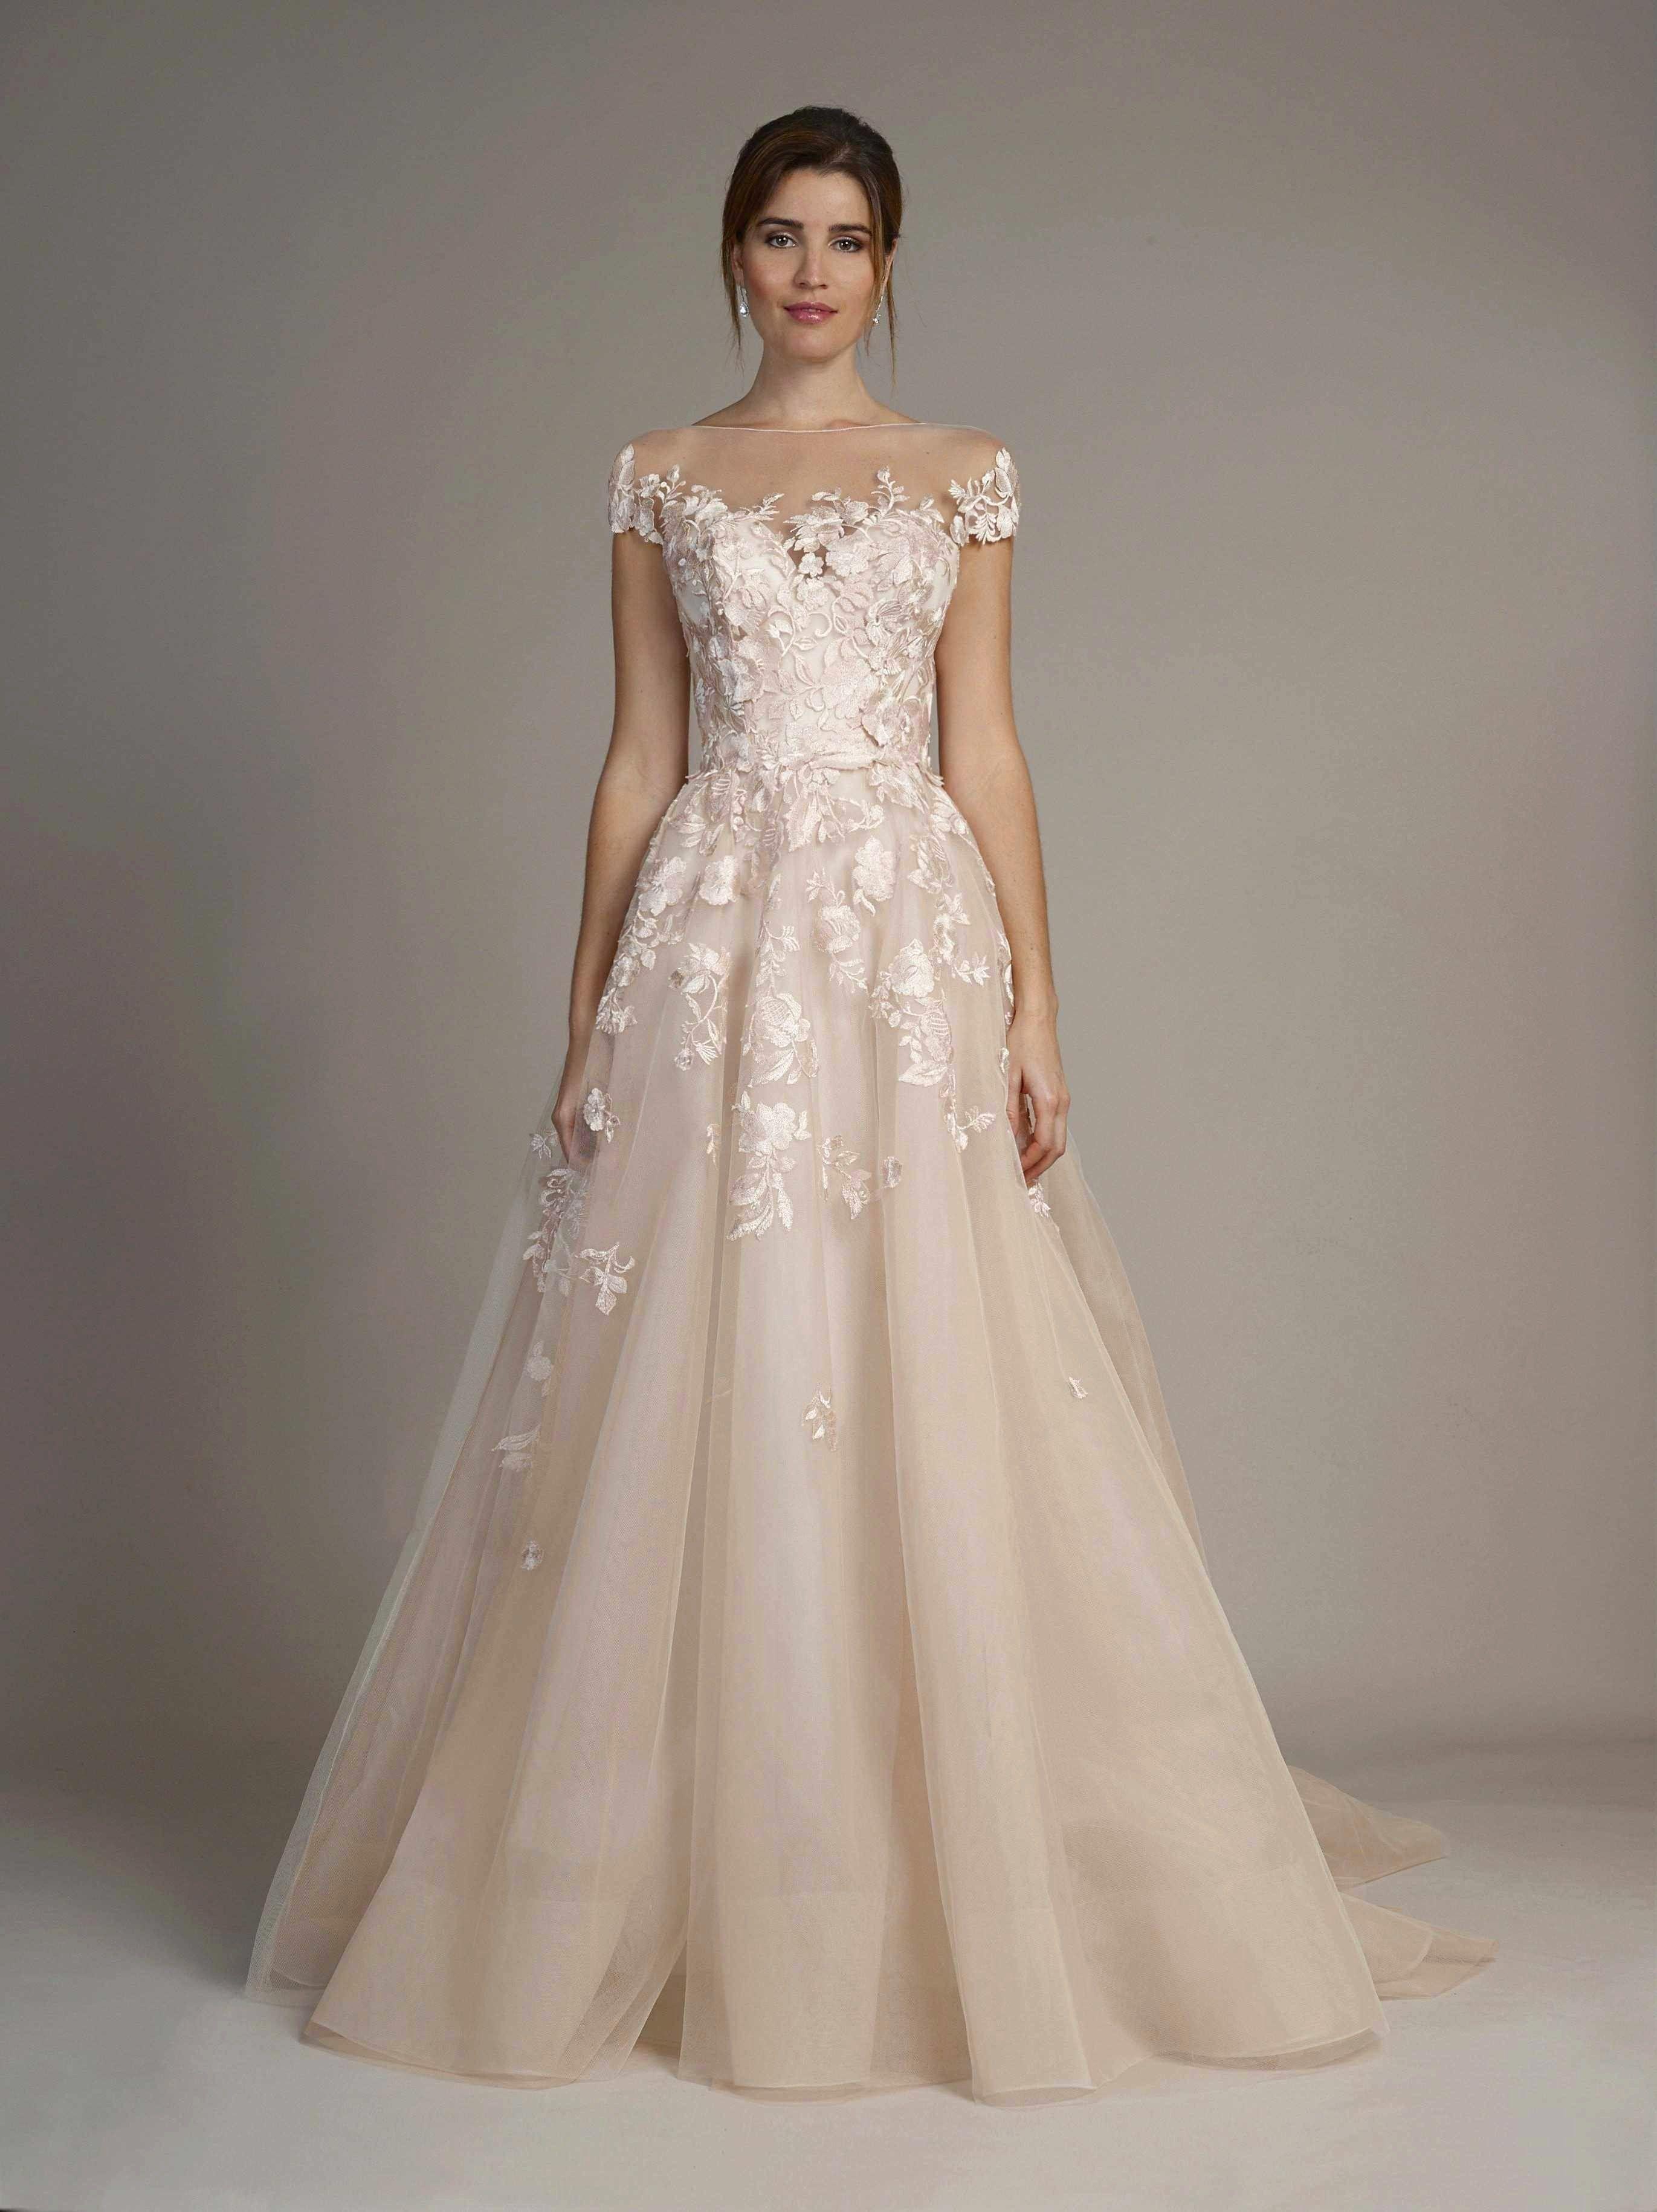 Kleinfeld bridal new york in 2020 petite wedding dress